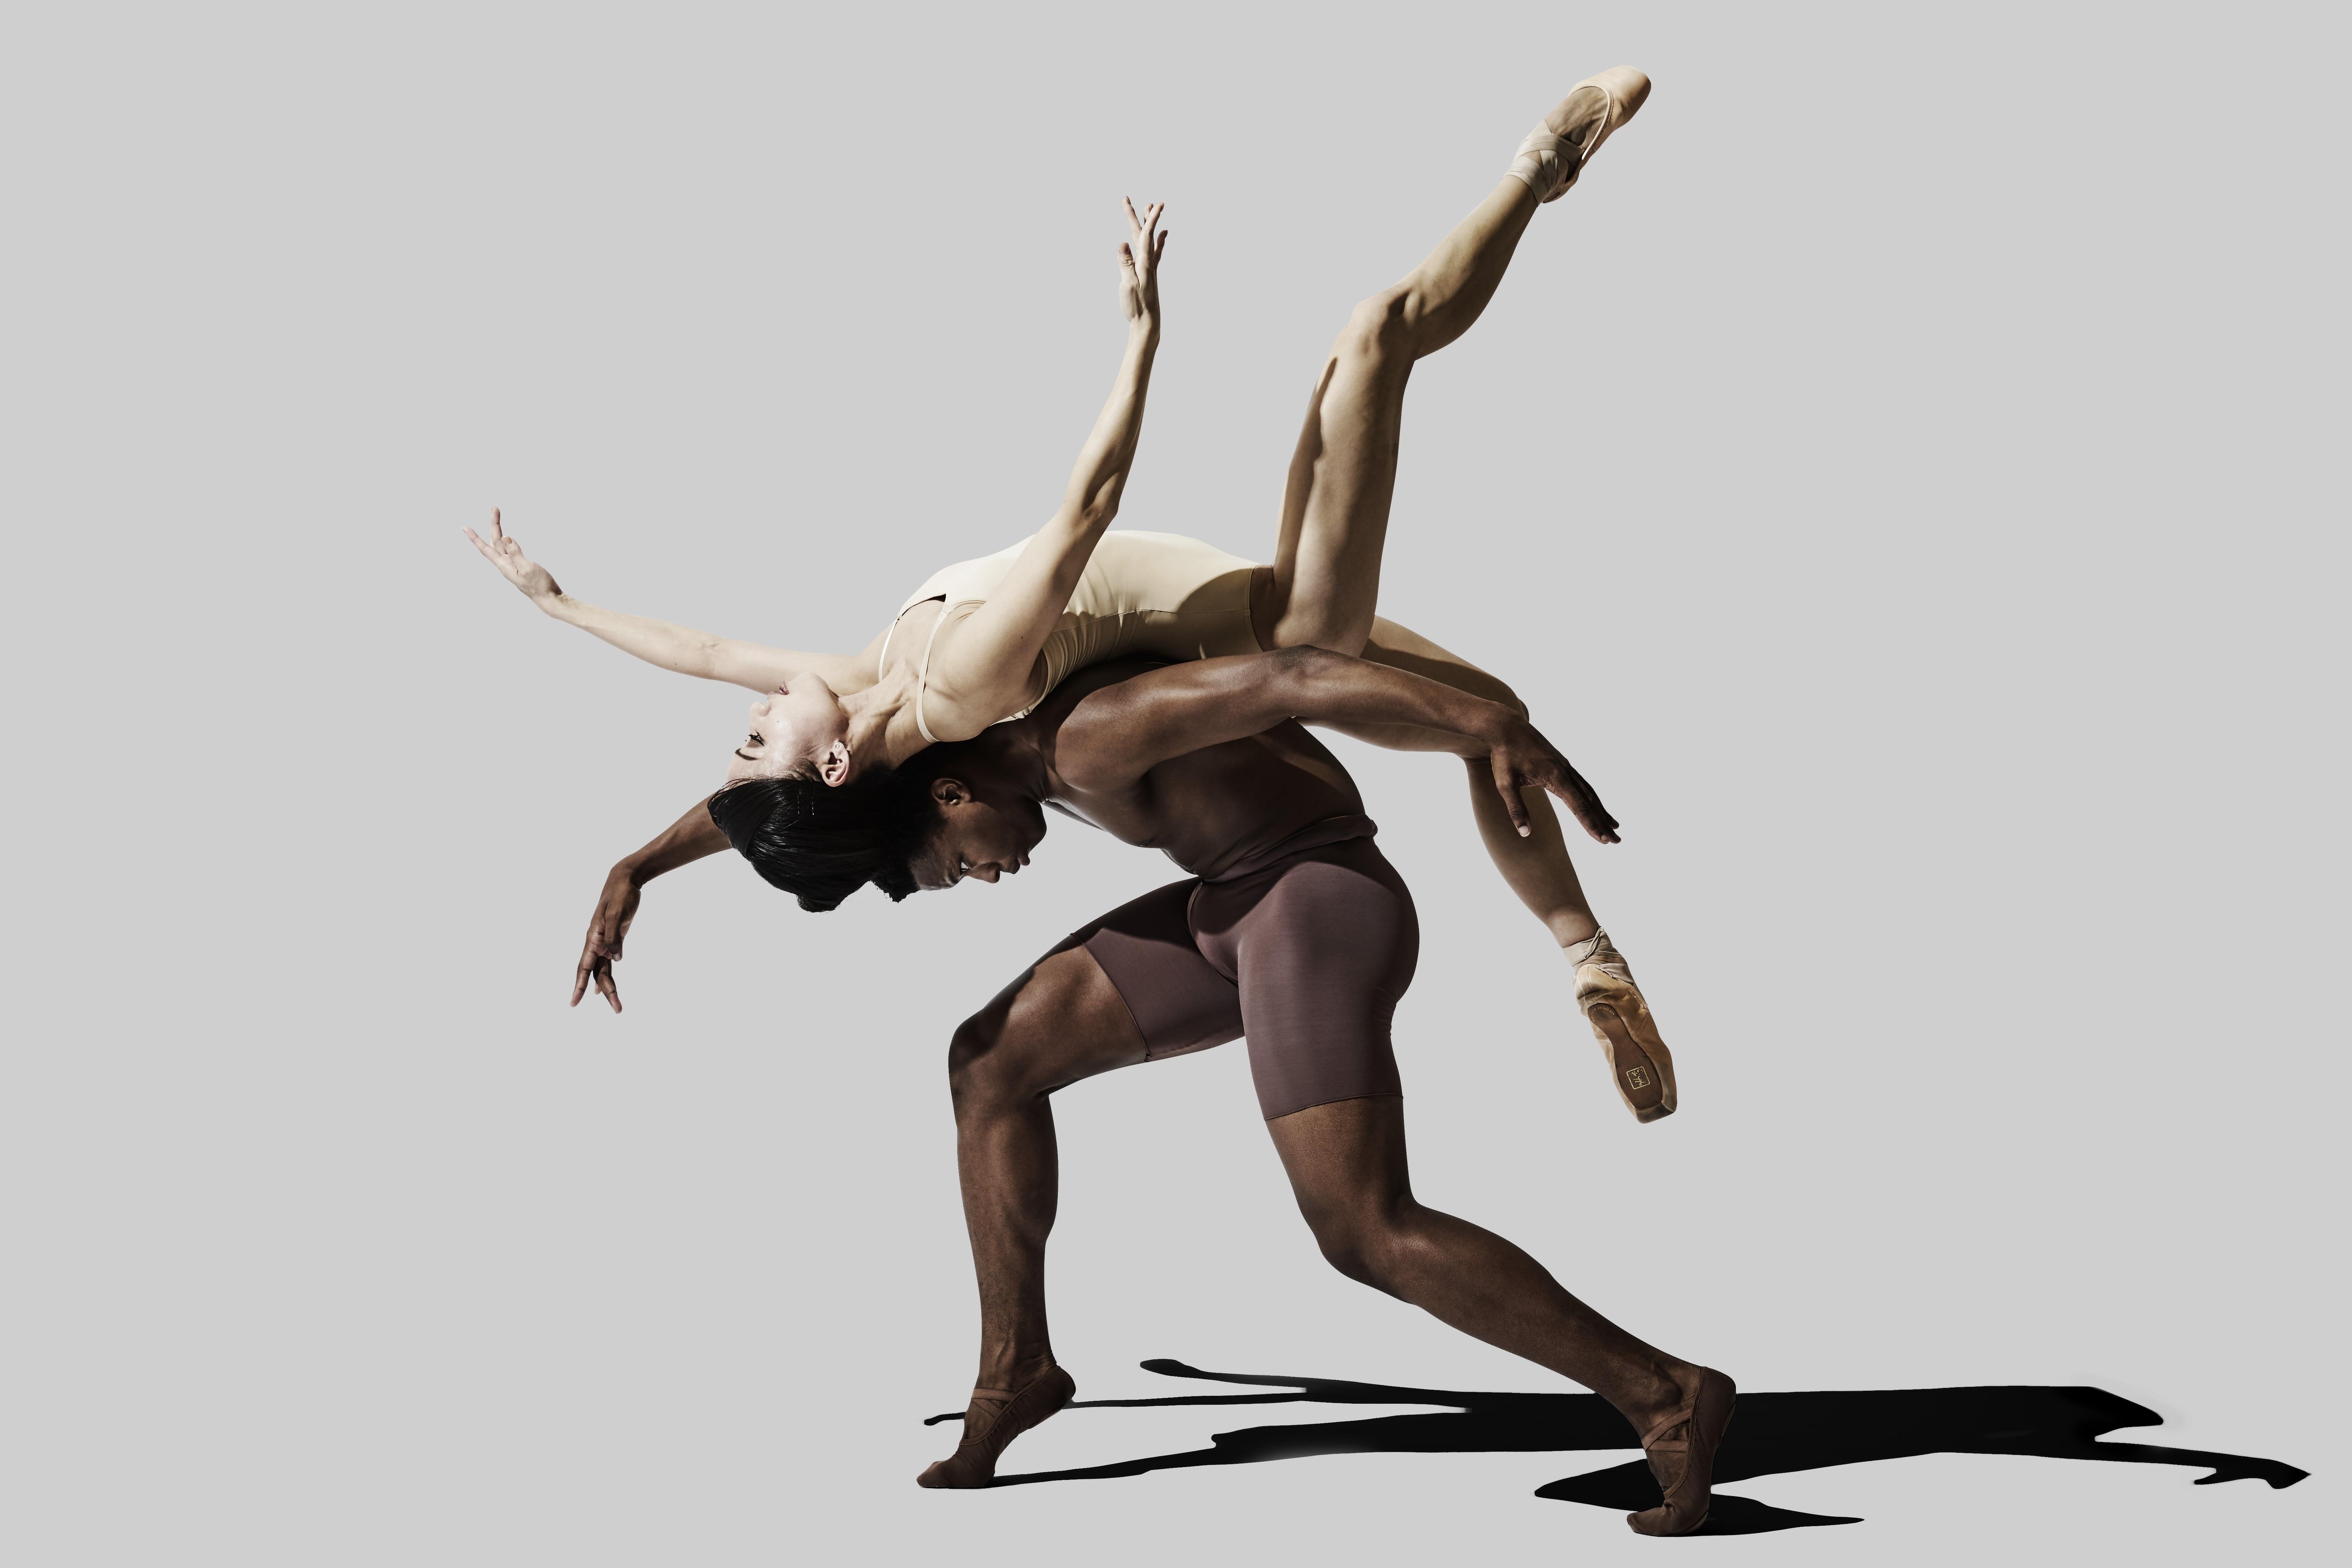 ballet black 4 kysbcm